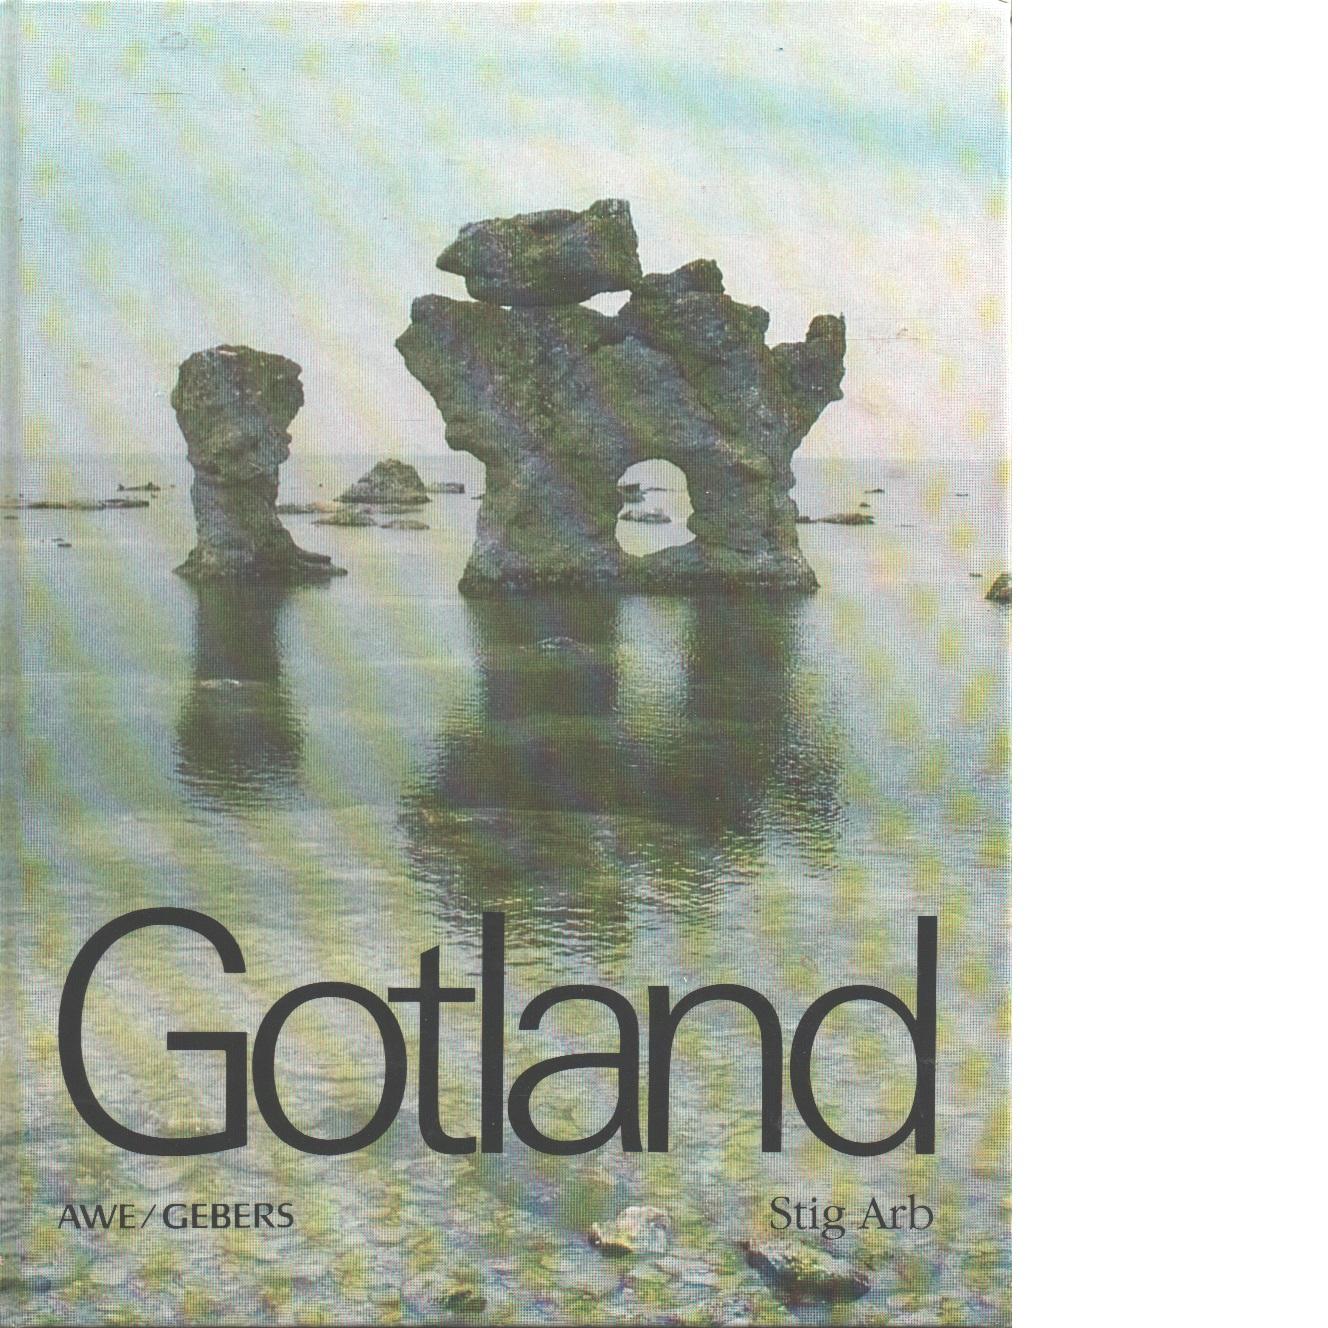 Gotland - Arb, Stig